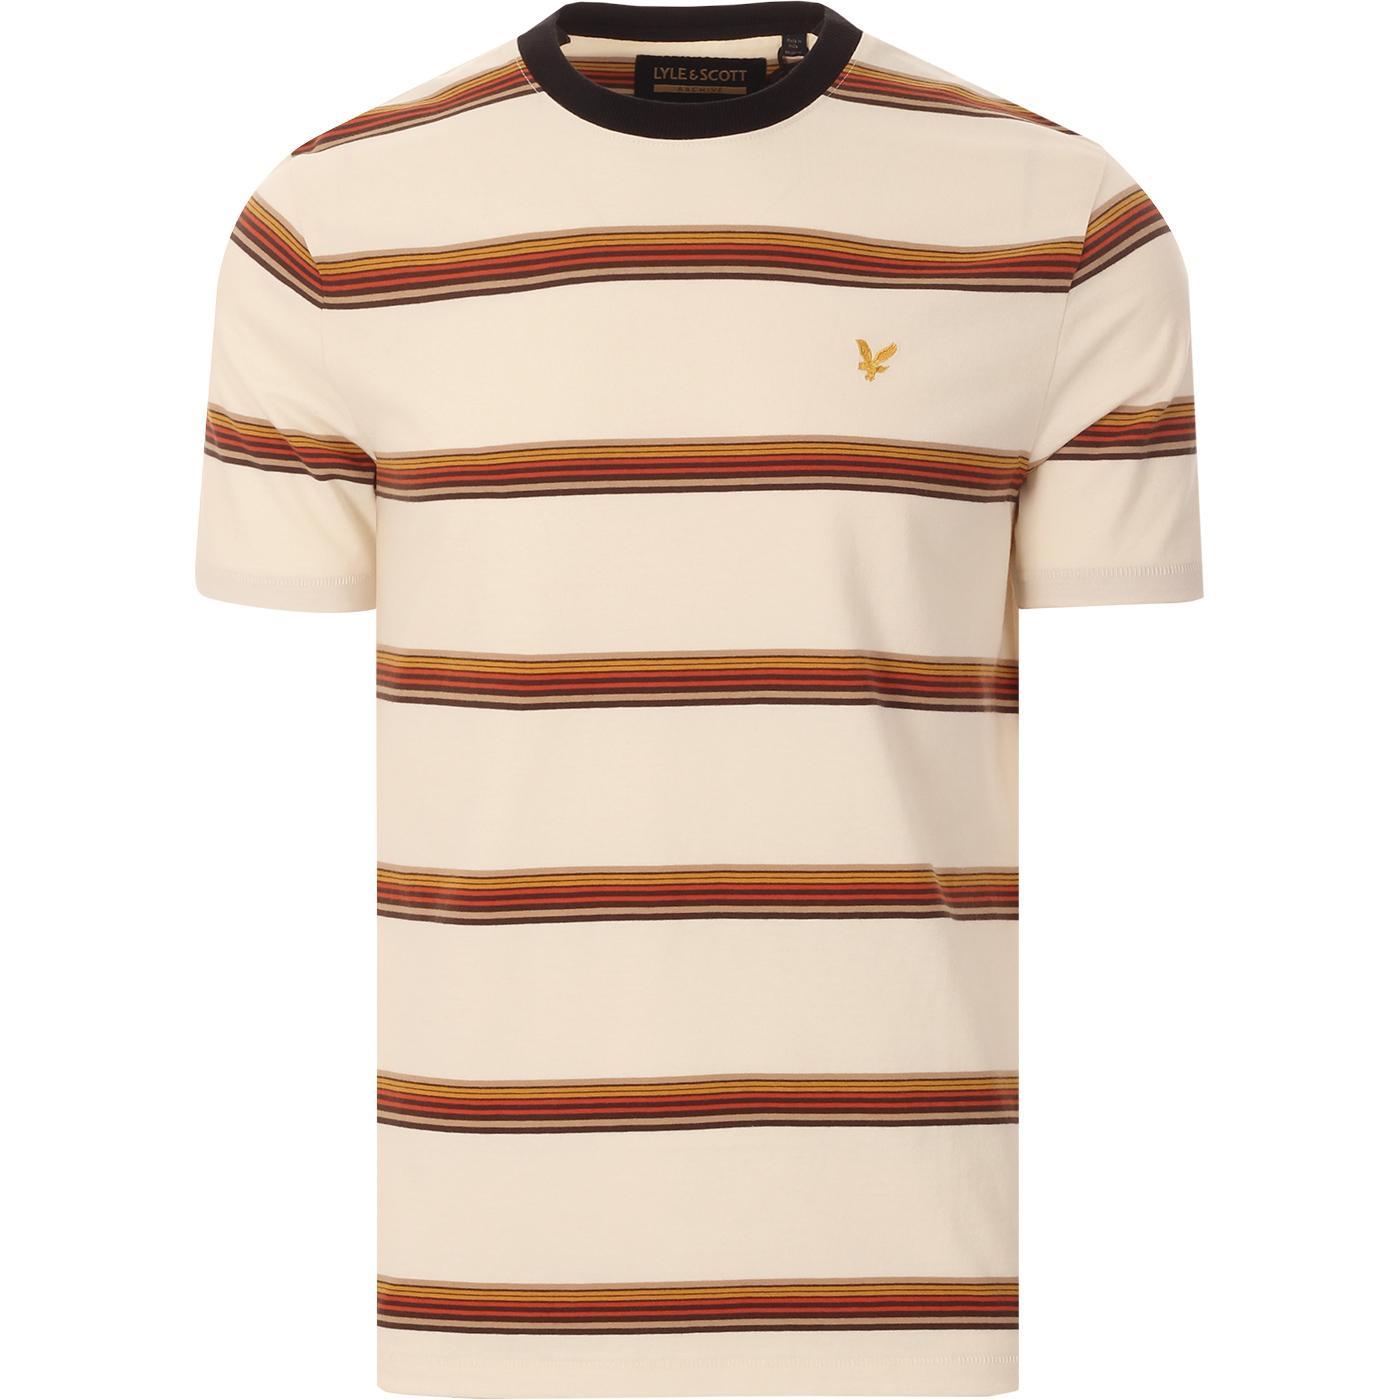 LYLE & SCOTT Retro 70s Multi Stripe T-shirt (VI)